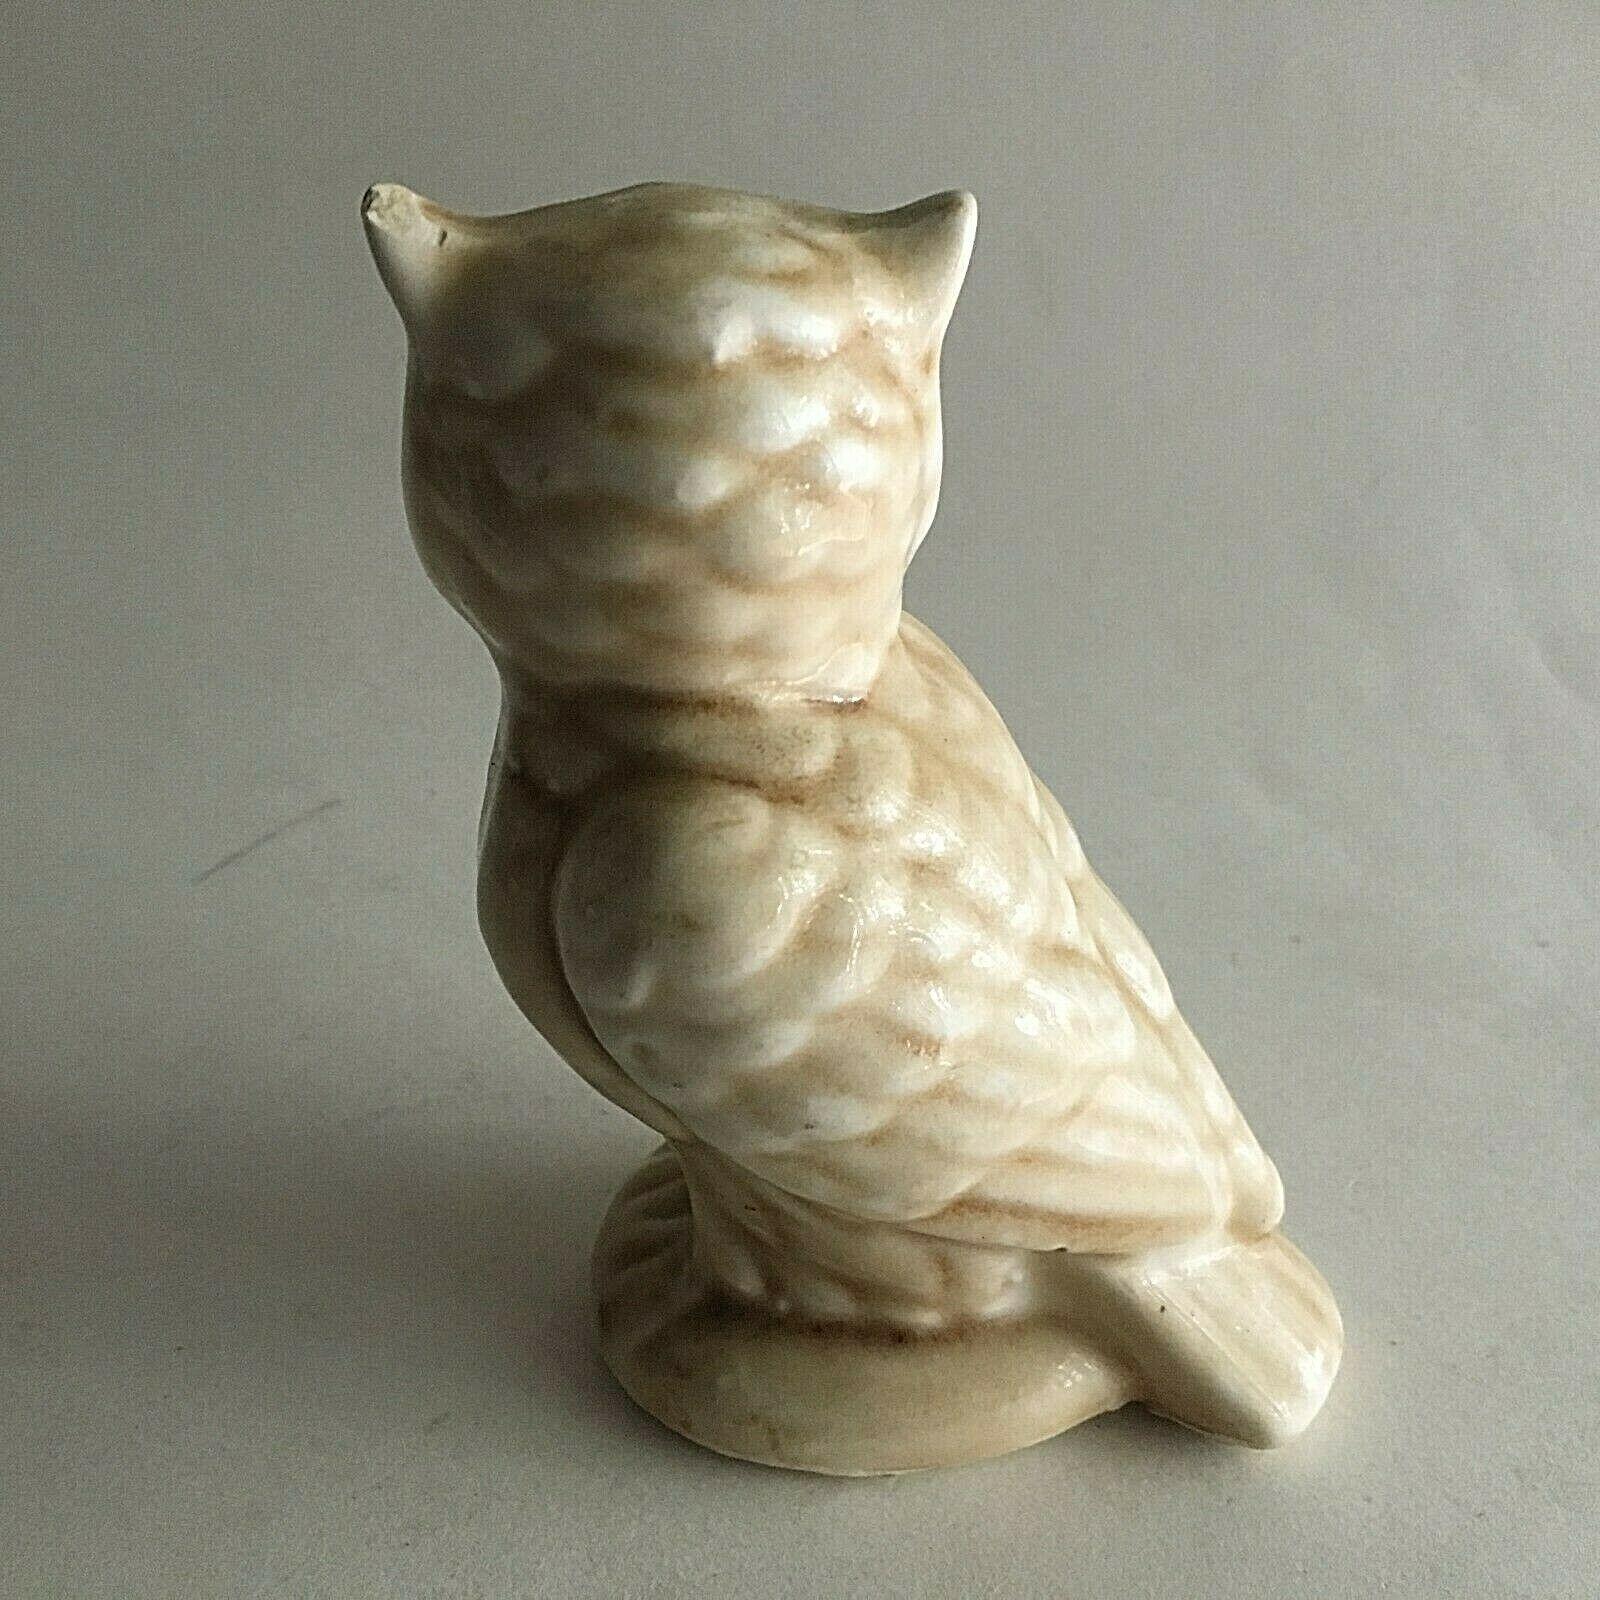 "Vintage Owl Ceramic Figurine Statue  4.75X3X2"" Mid Century Collectible"